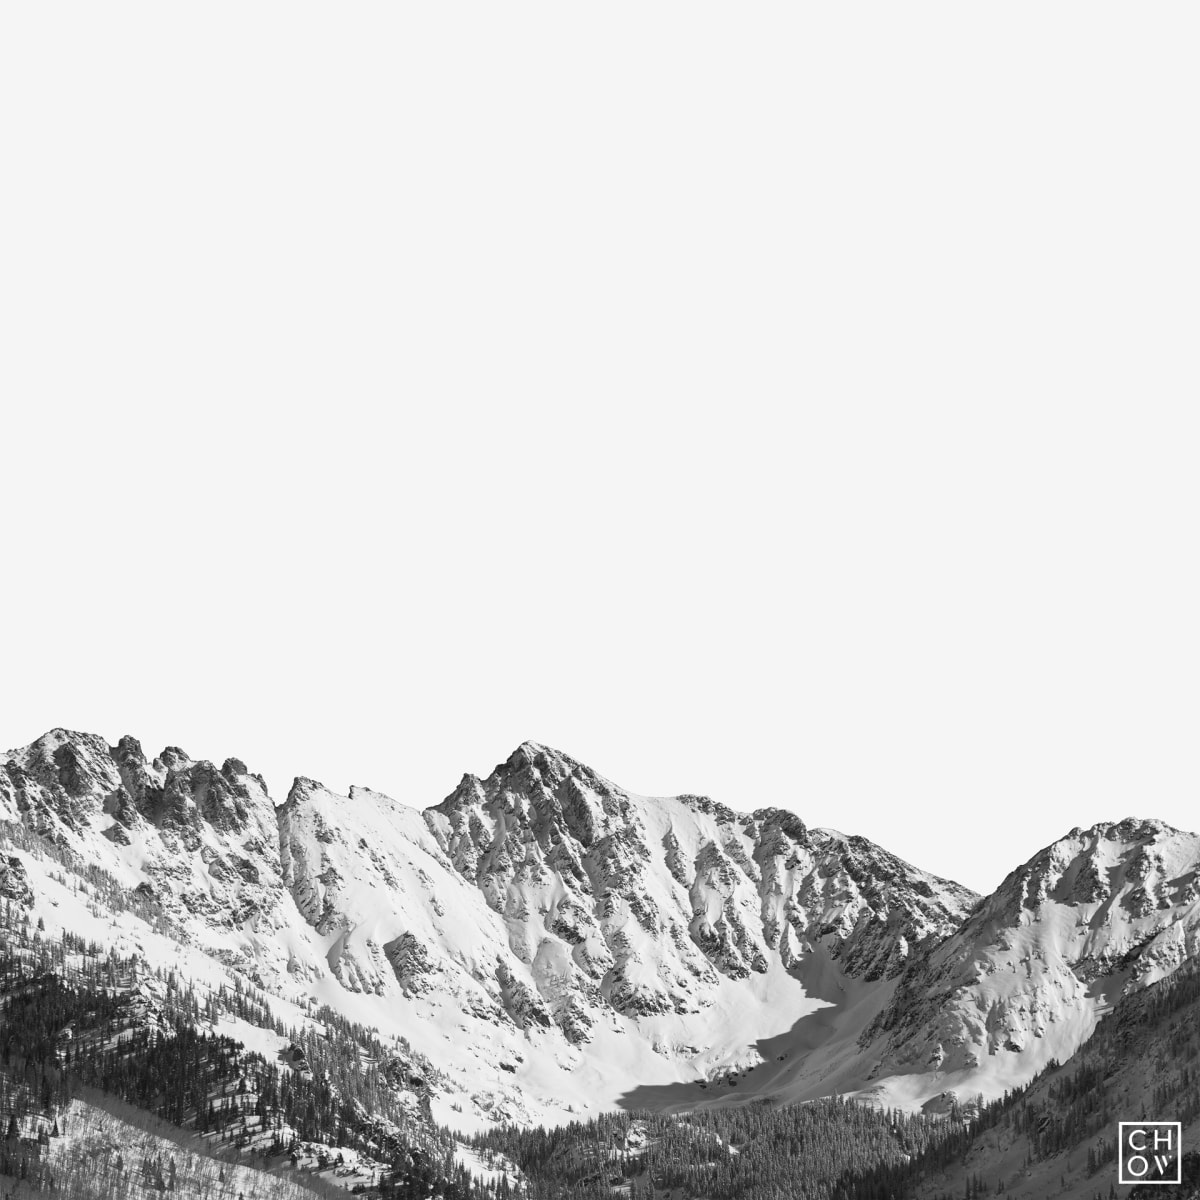 Austin Chow, Gore Range // Vail, Colorado, 2018